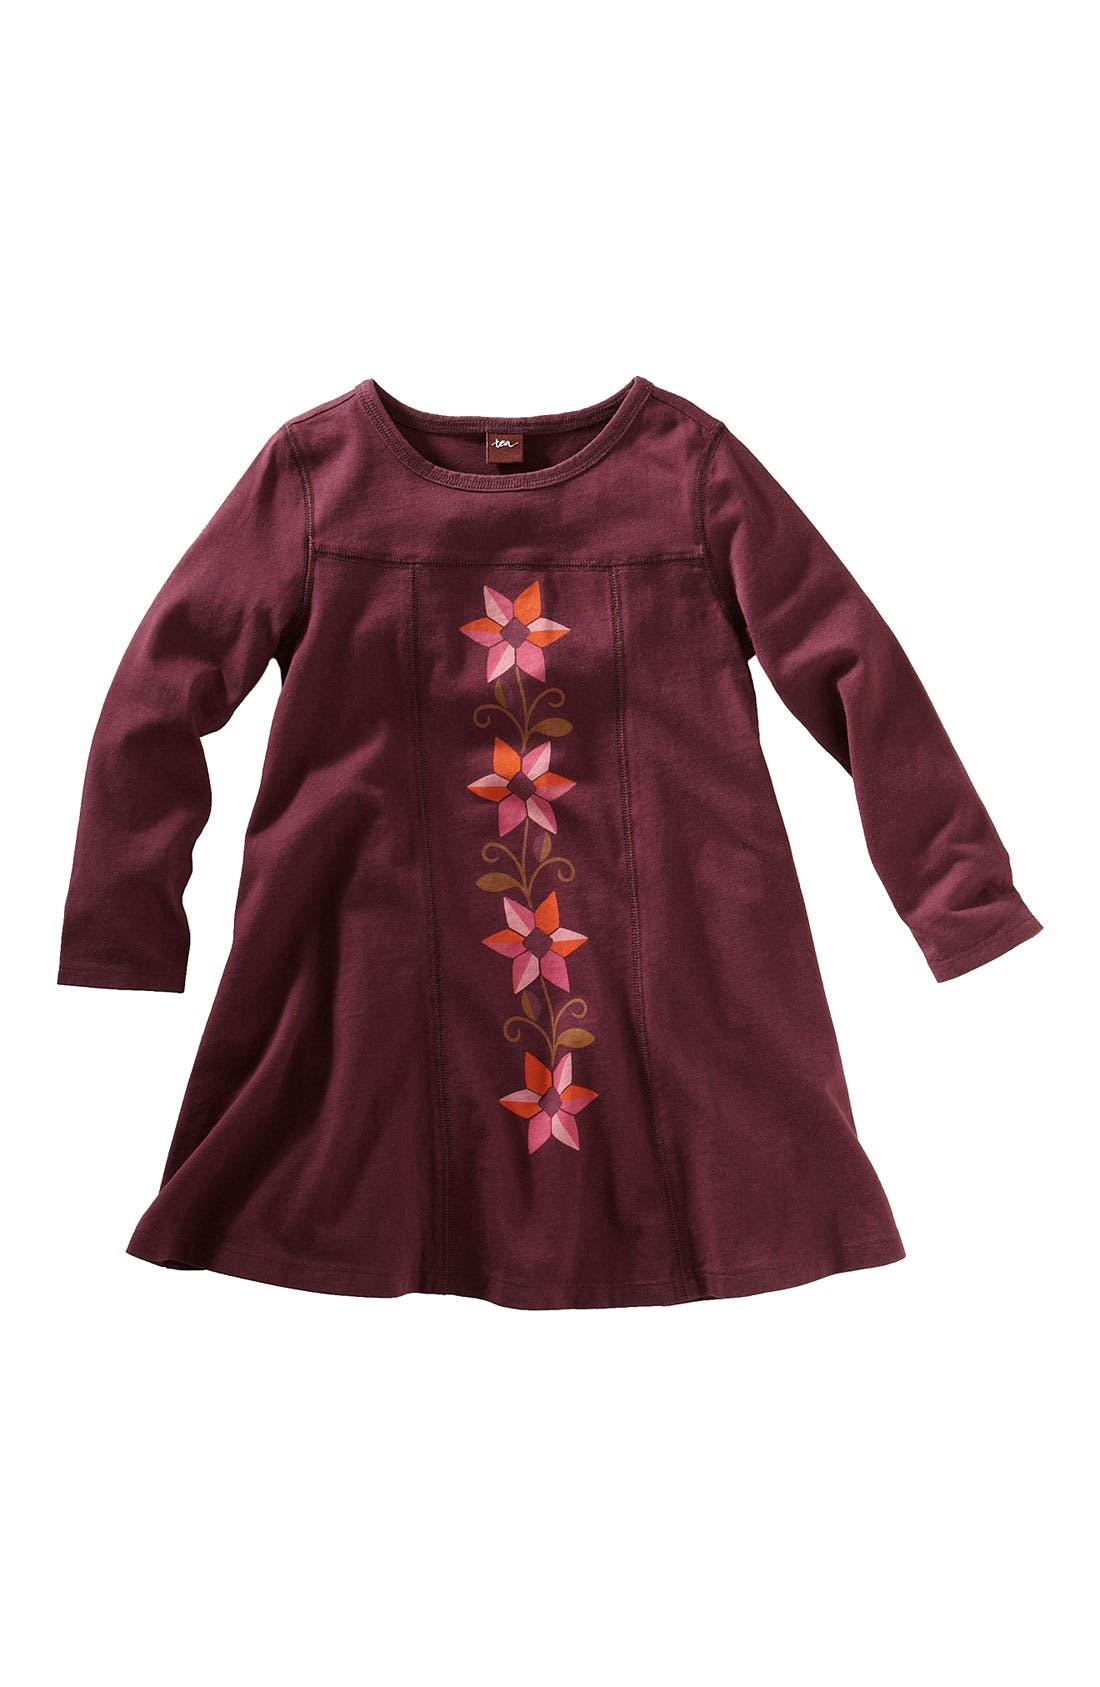 Alternate Image 1 Selected - Tea Collection 'Matilde Flores' Dress (Toddler)